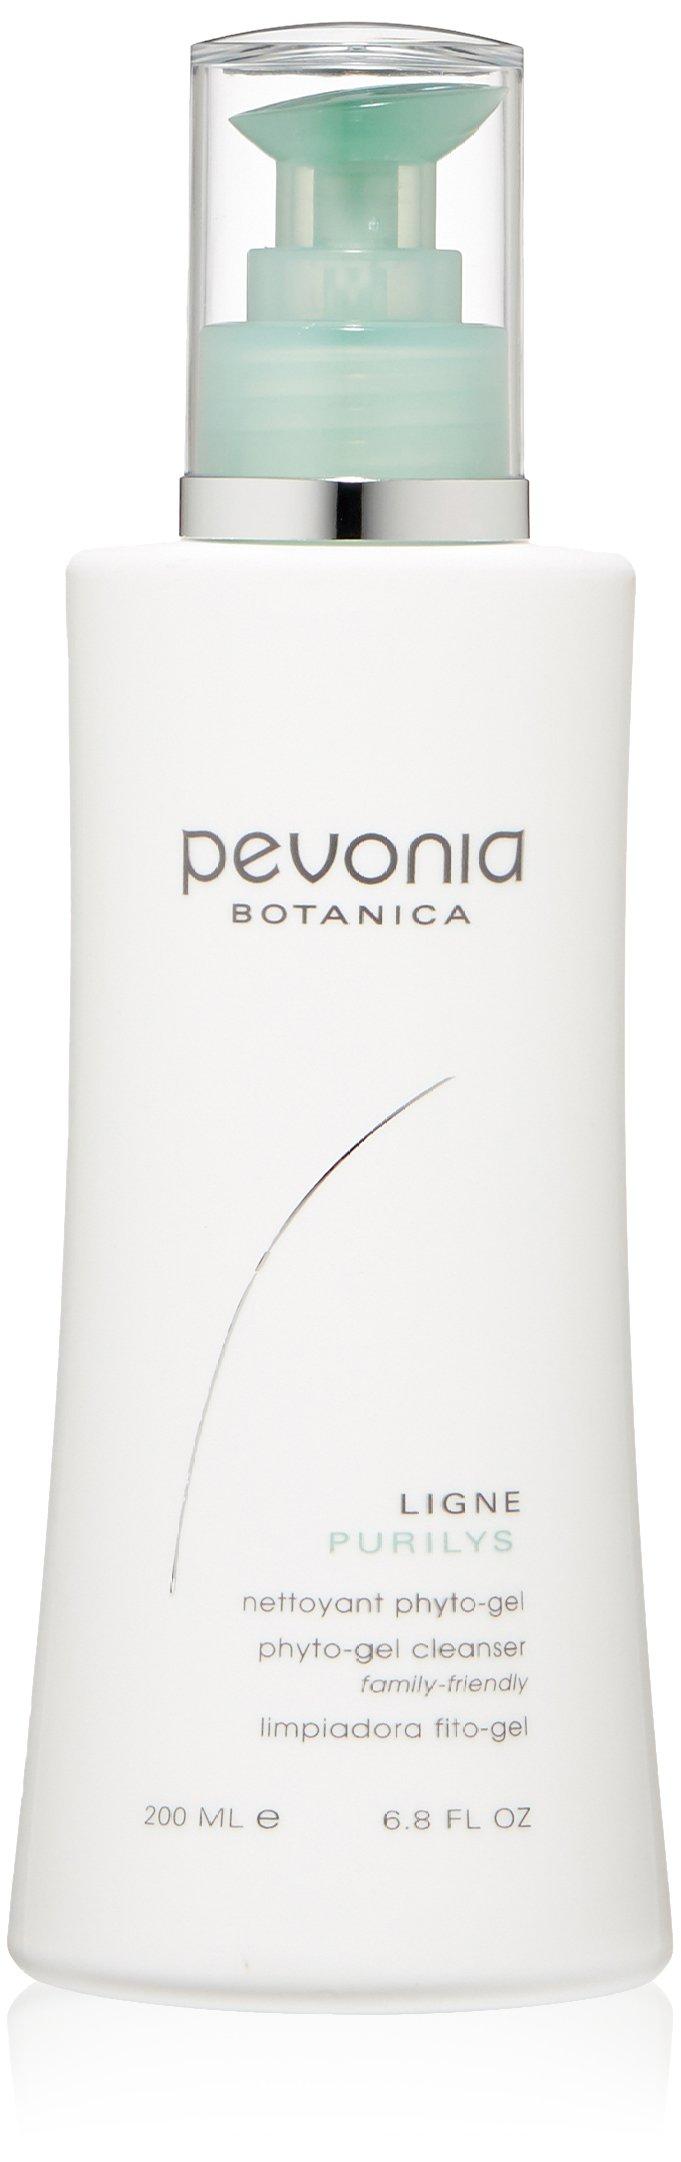 Pevonia Phyto-Gel Cleanser, 6.8 Fl Oz